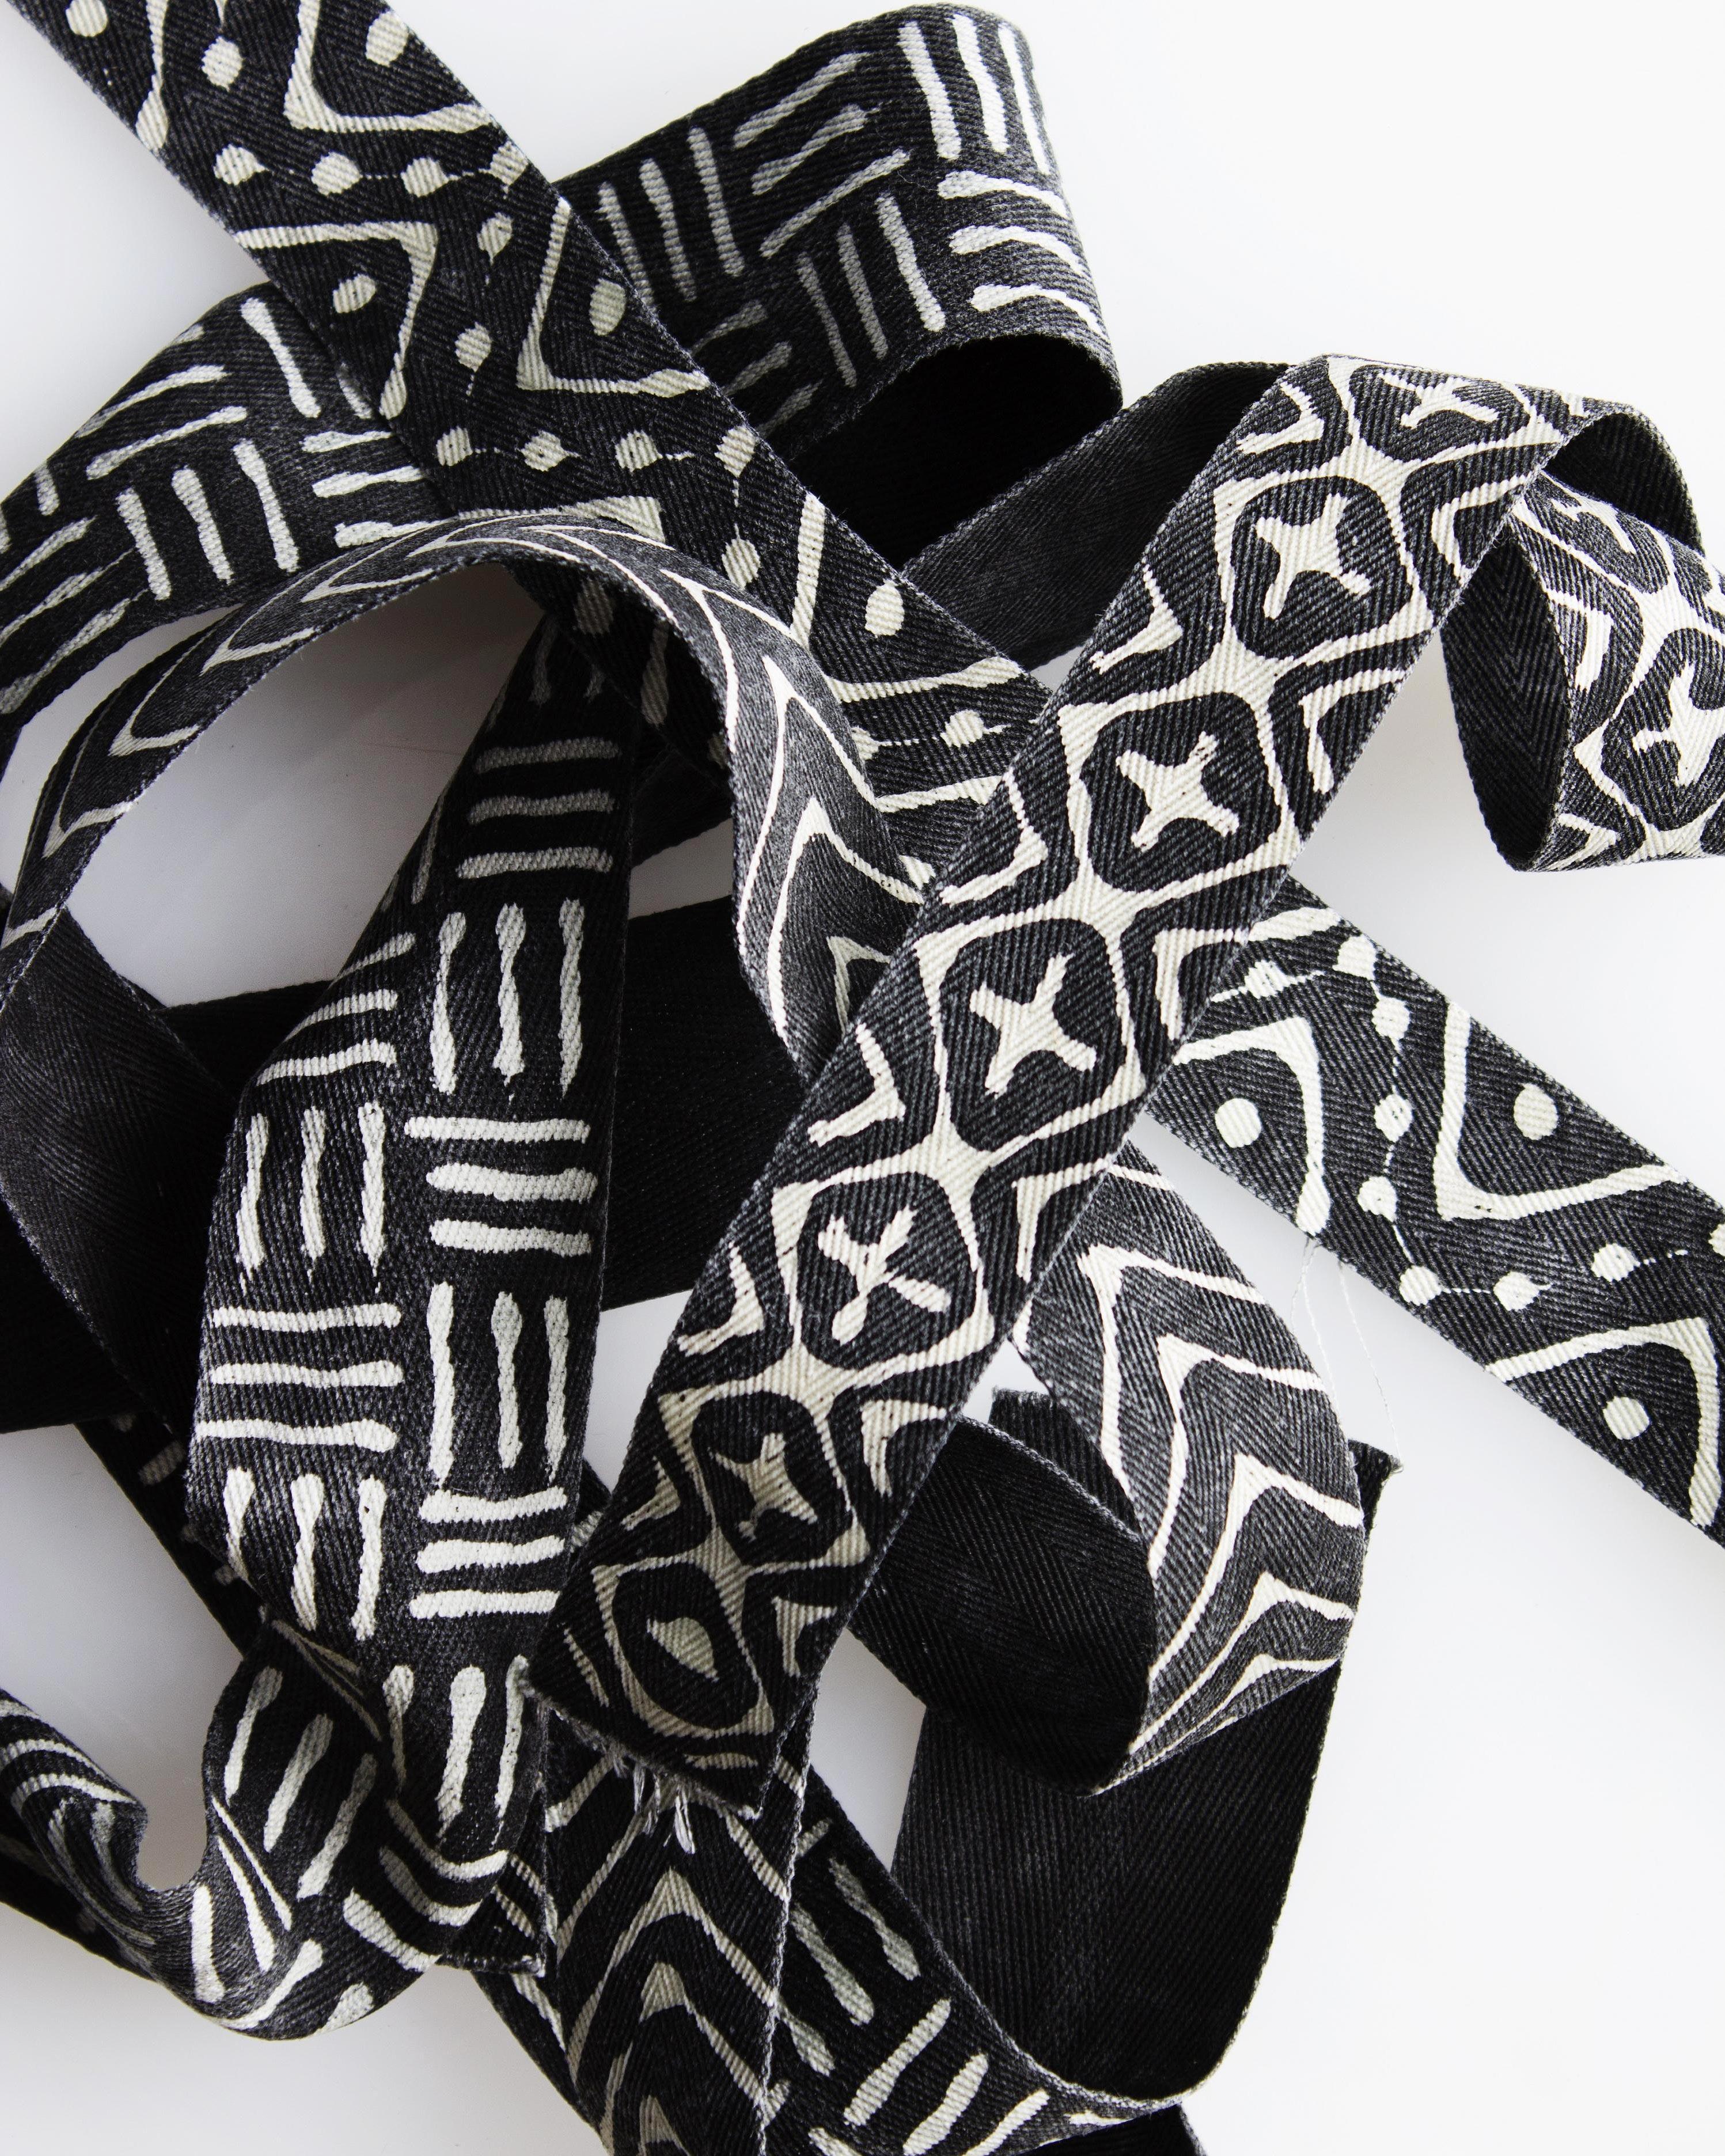 david-stark-diy-mudcloth-ribbon-5-0516.jpg